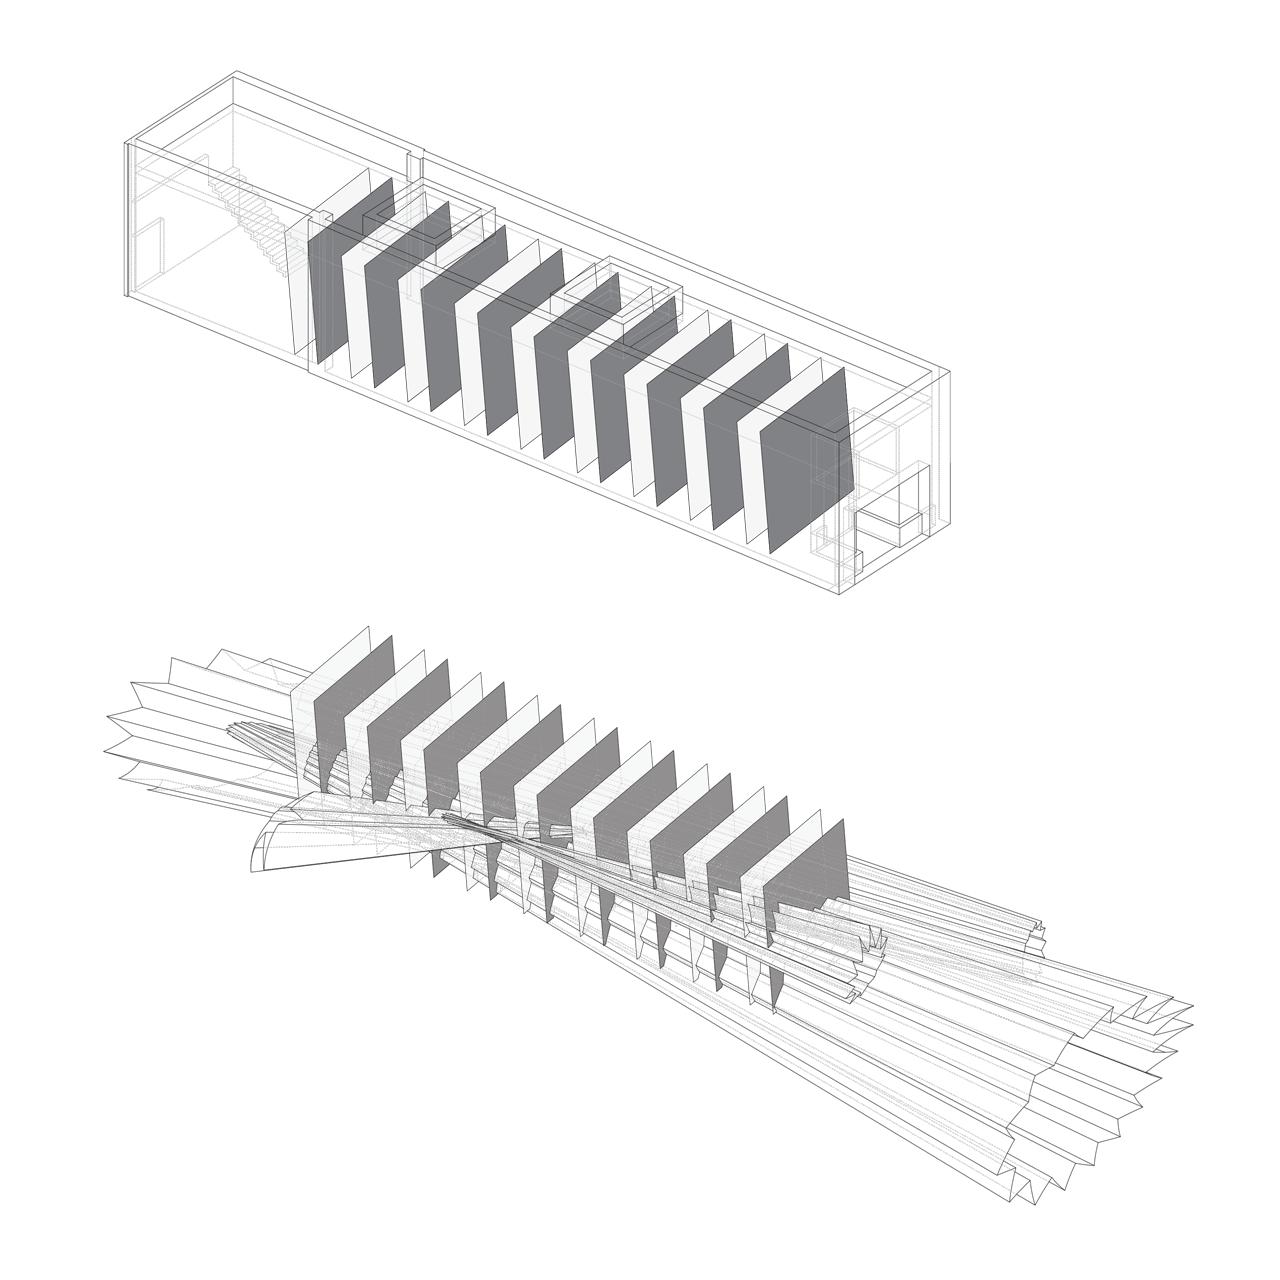 steven-christensen_spatial-ops_the-beta-movement_diagram_2_1280.png